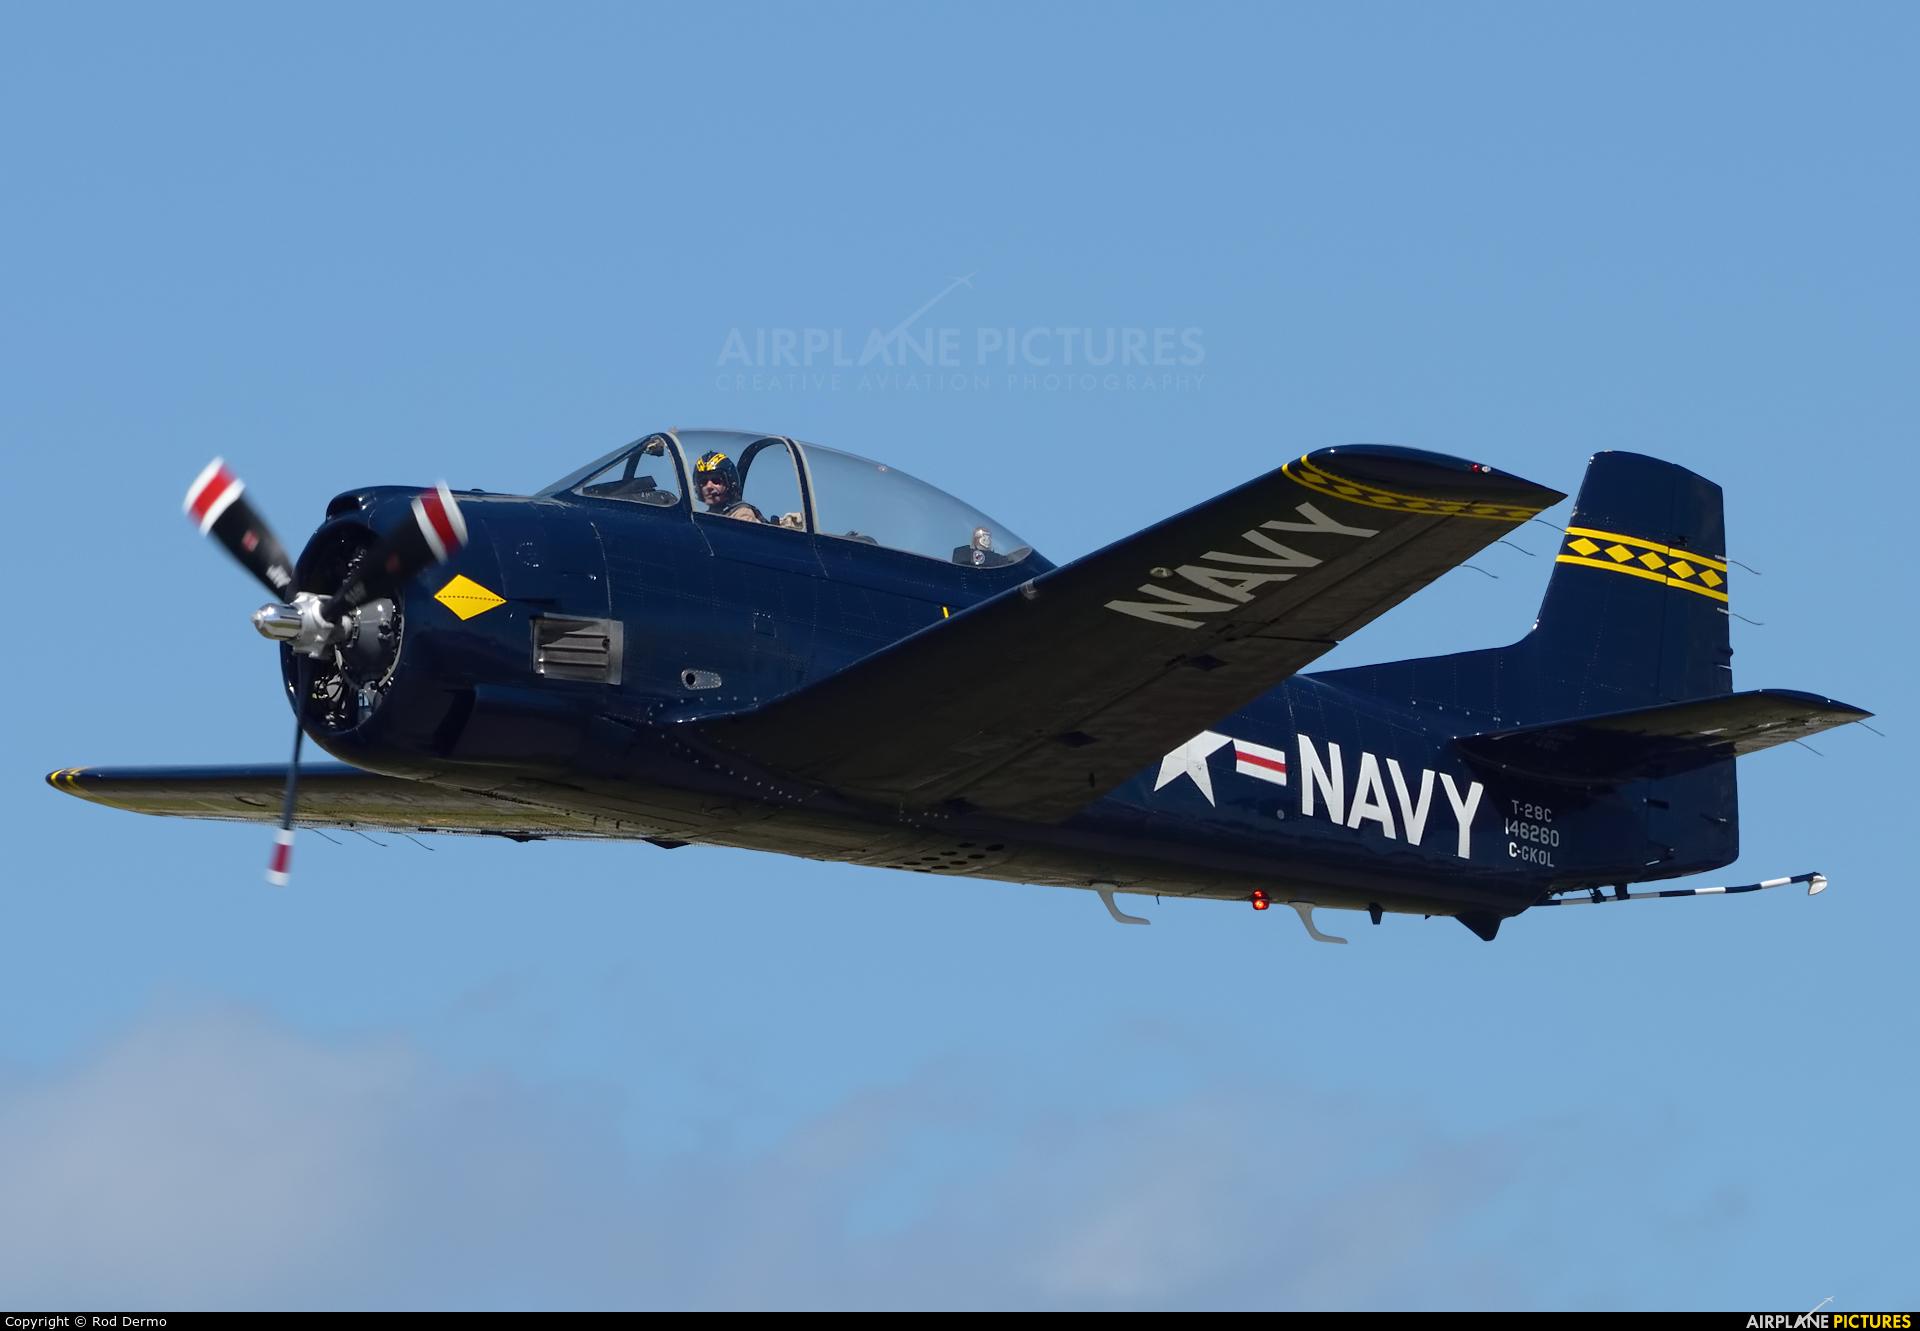 Private C-GKOL aircraft at Brantford, ON